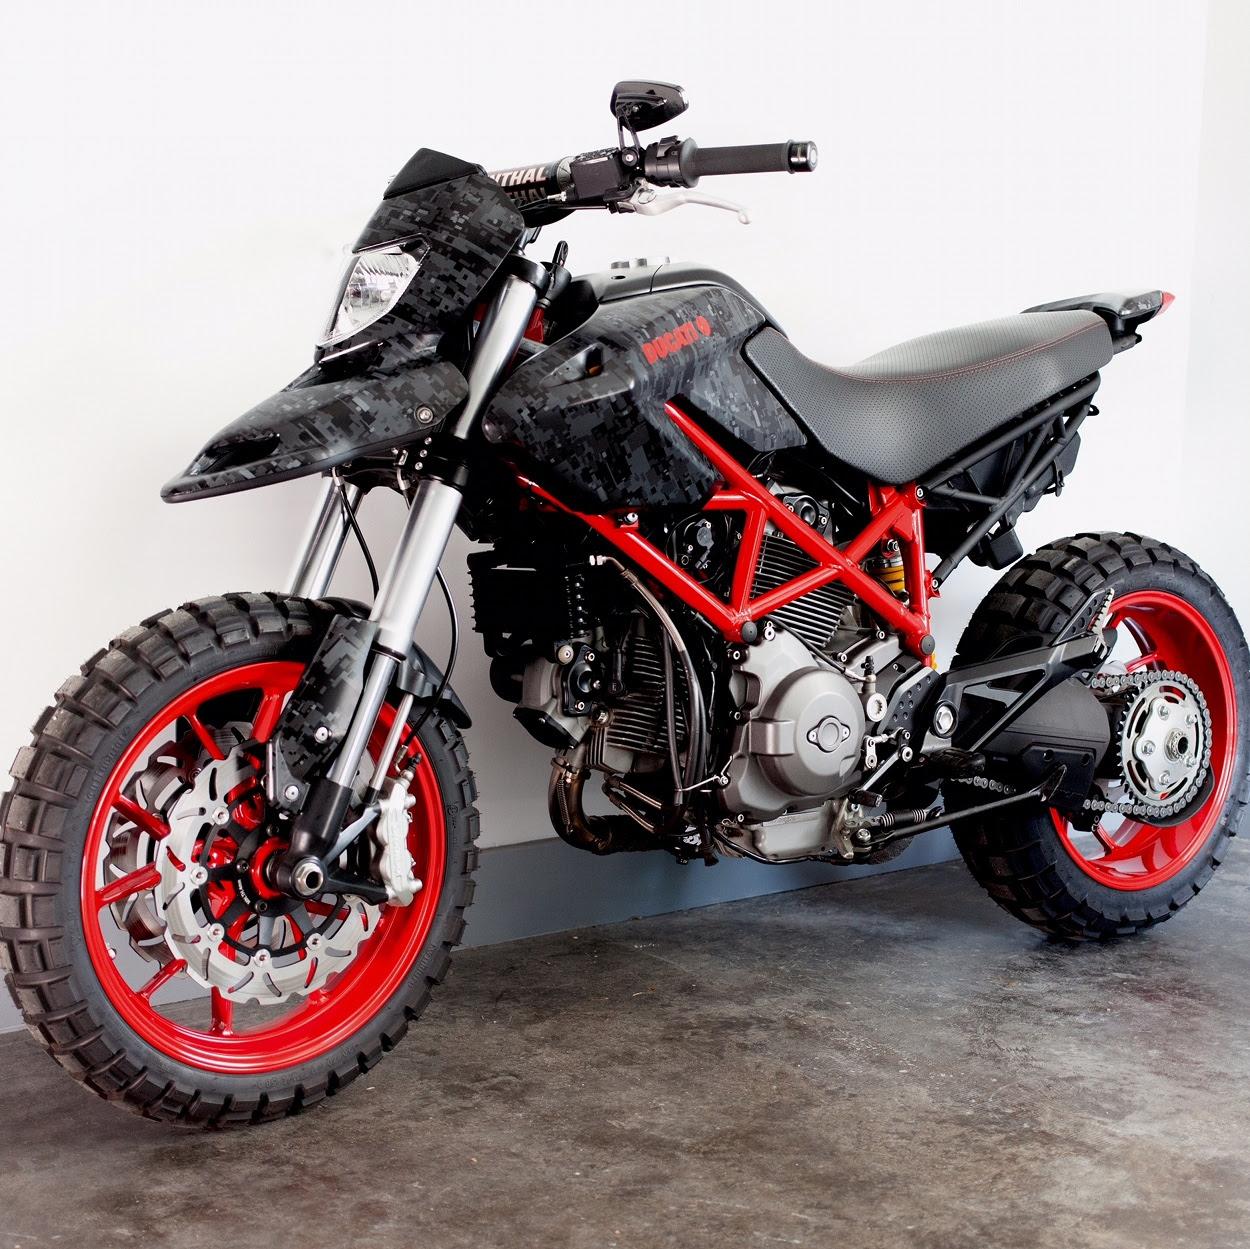 Custom Ducati Hypermotard 796 By Jesse Spade Bikebound